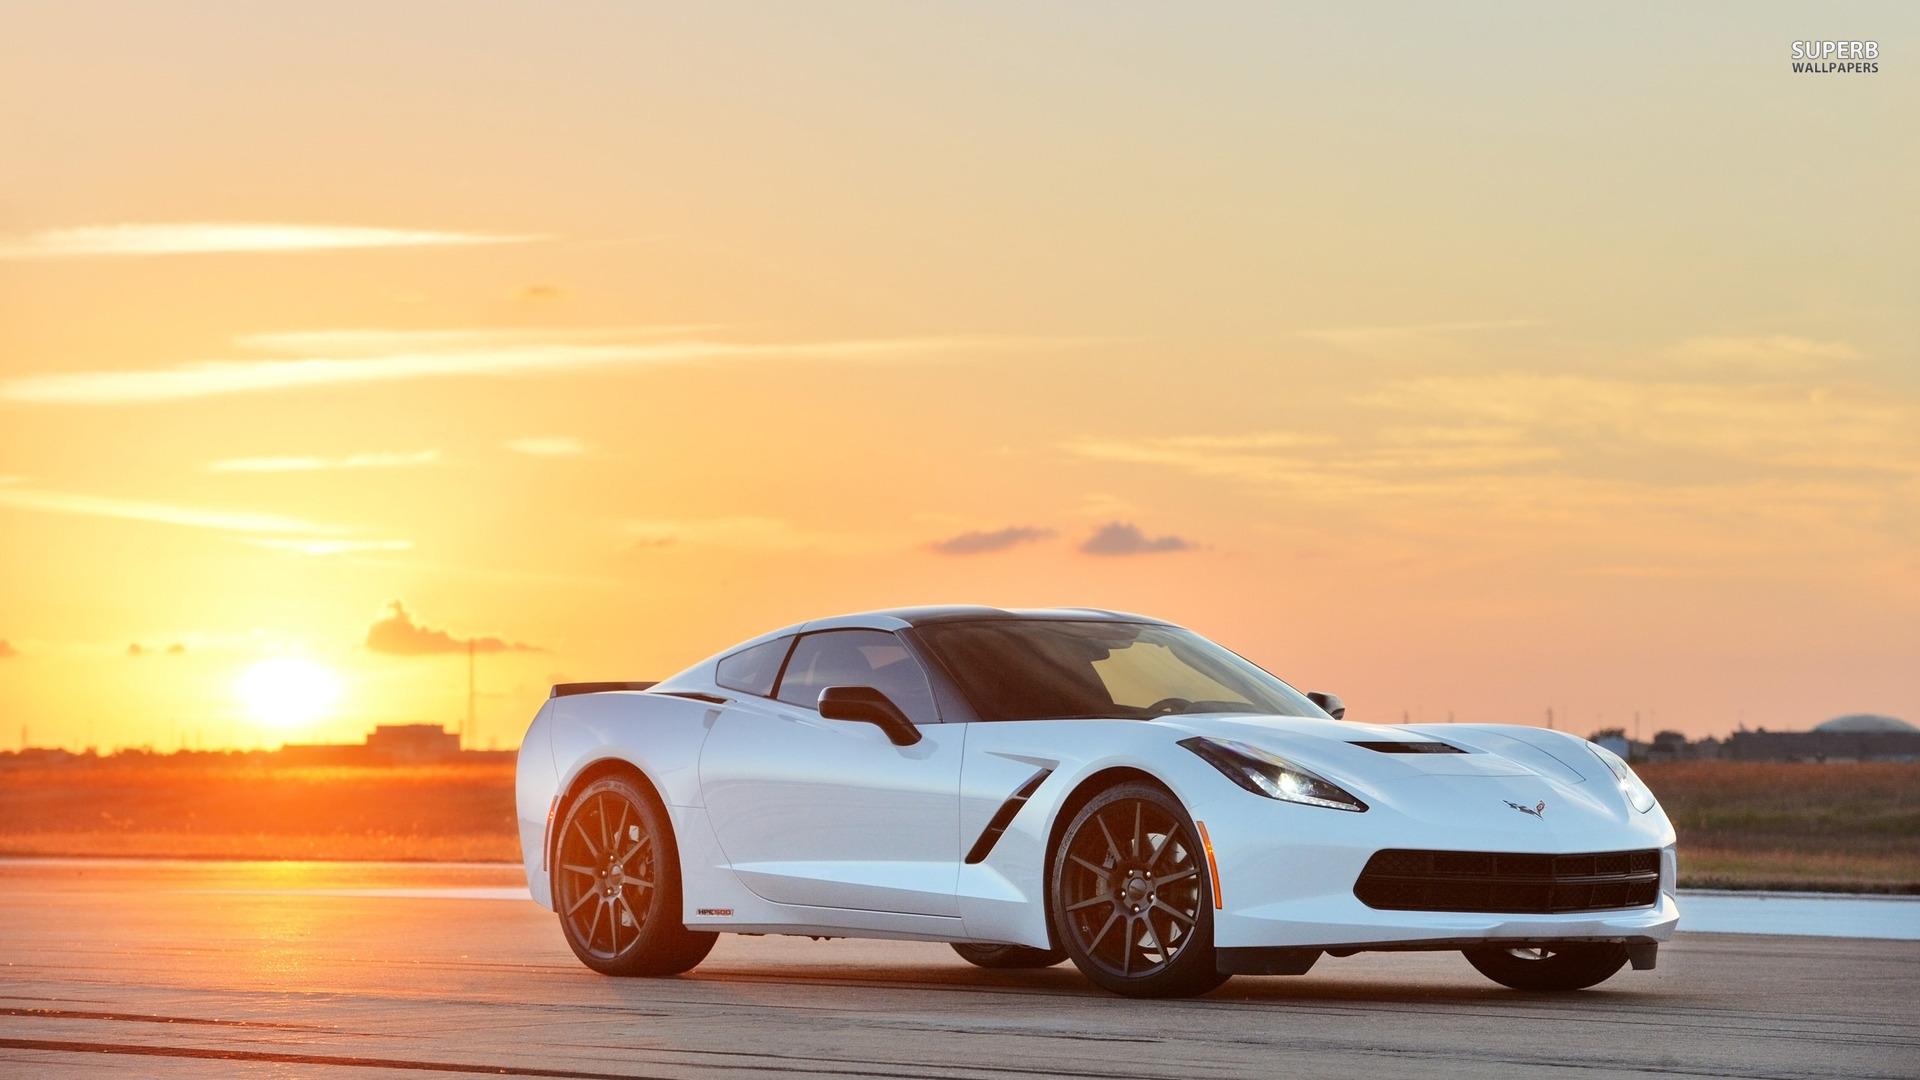 GT5 2014 Corvette Stingray C7 Wallpaper 19202151080 Engine 1920x1080